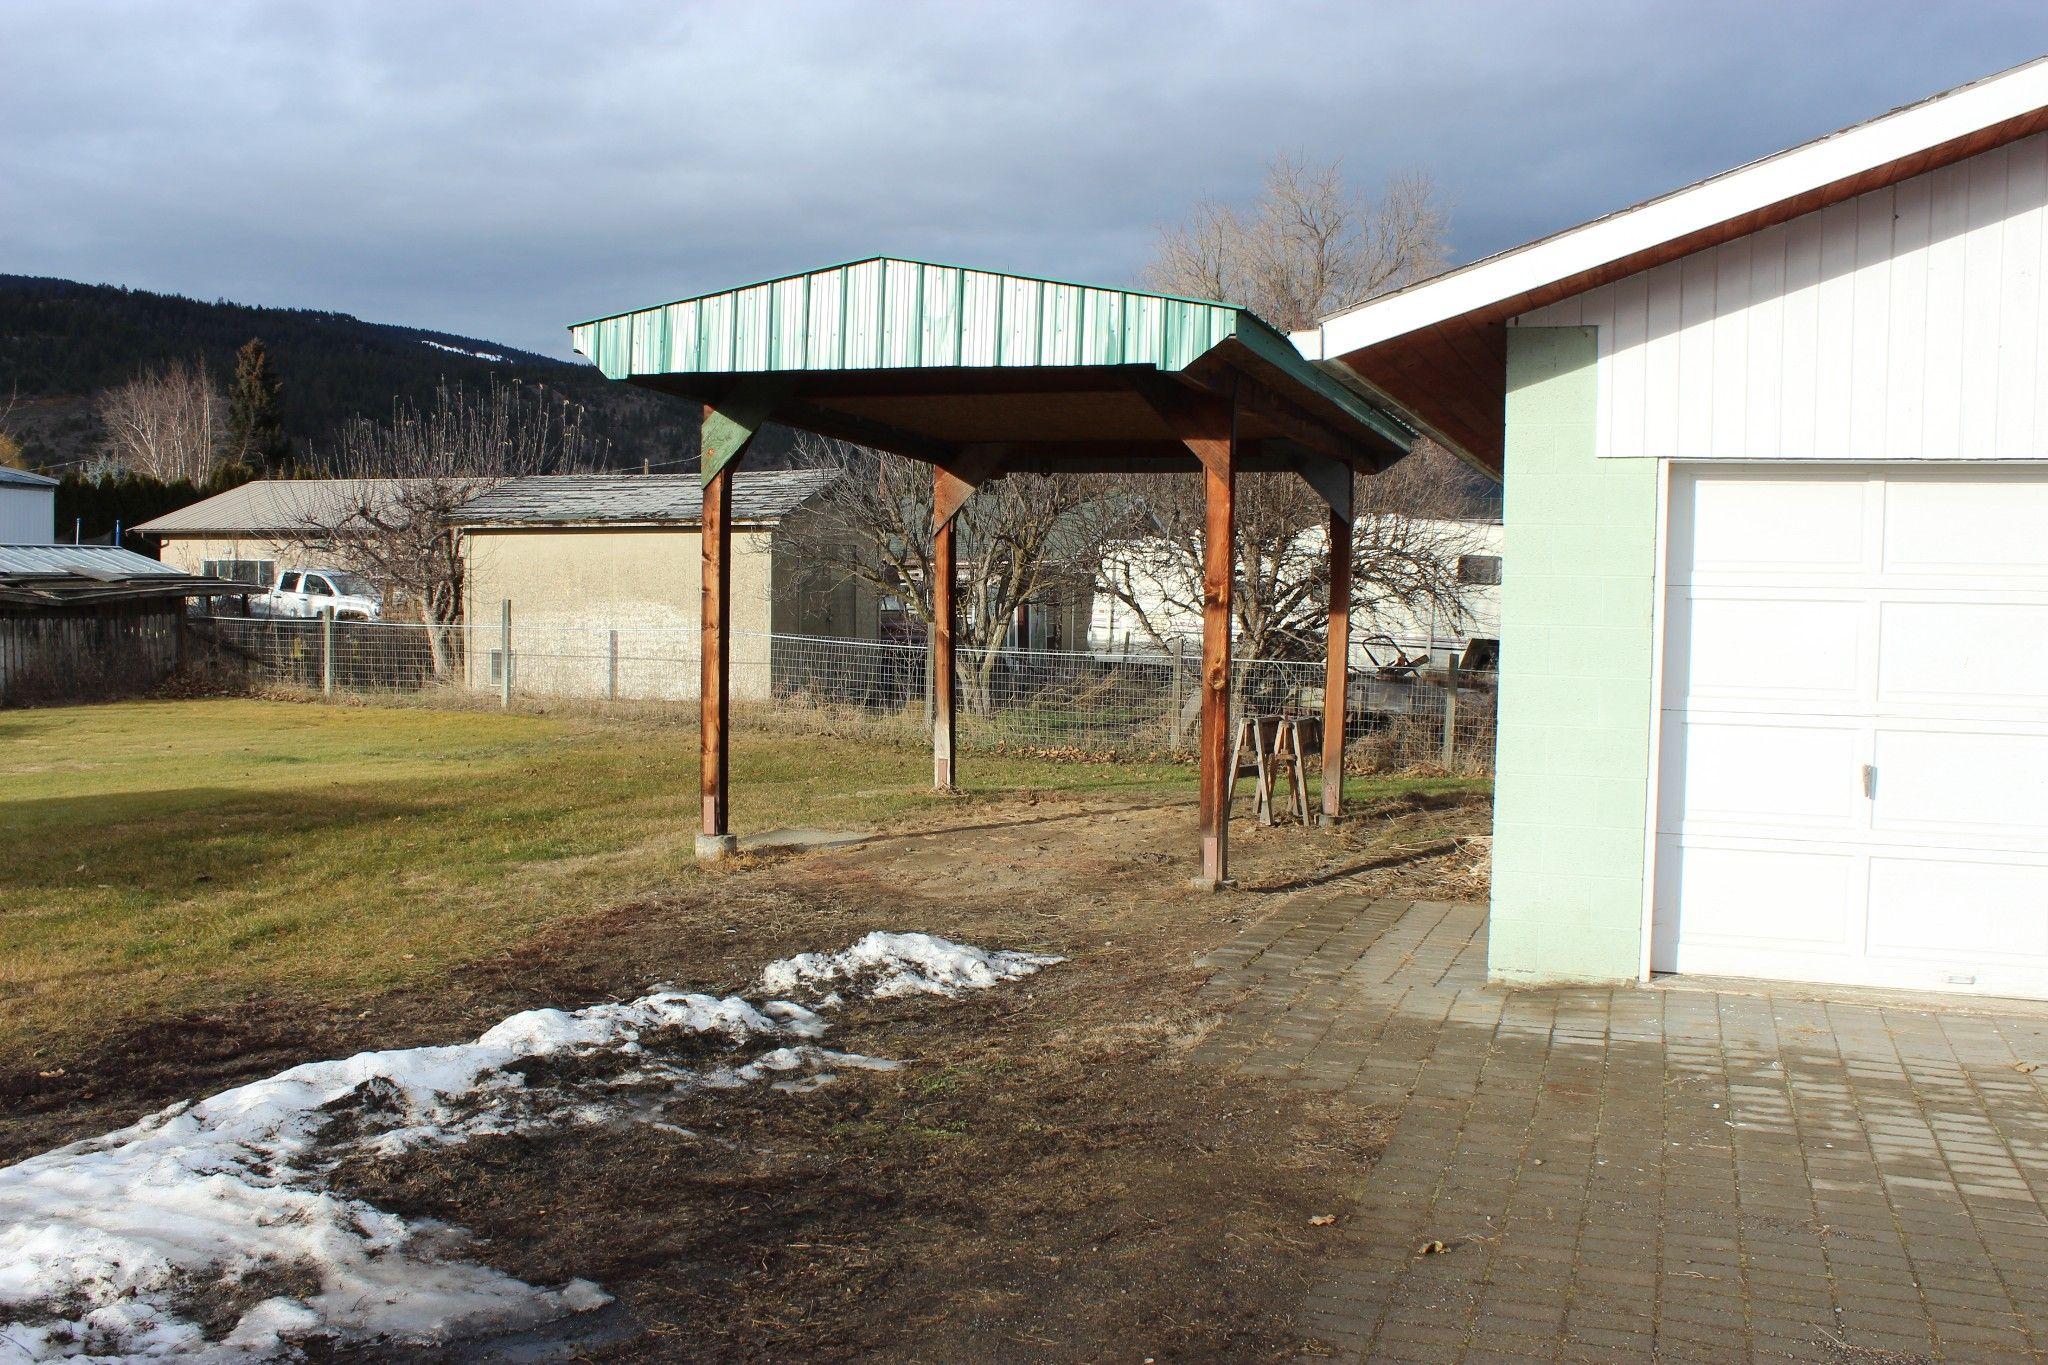 Photo 17: Photos: 6725 Heffley Road in Kamloops: Heffley House for sale : MLS®# 160007